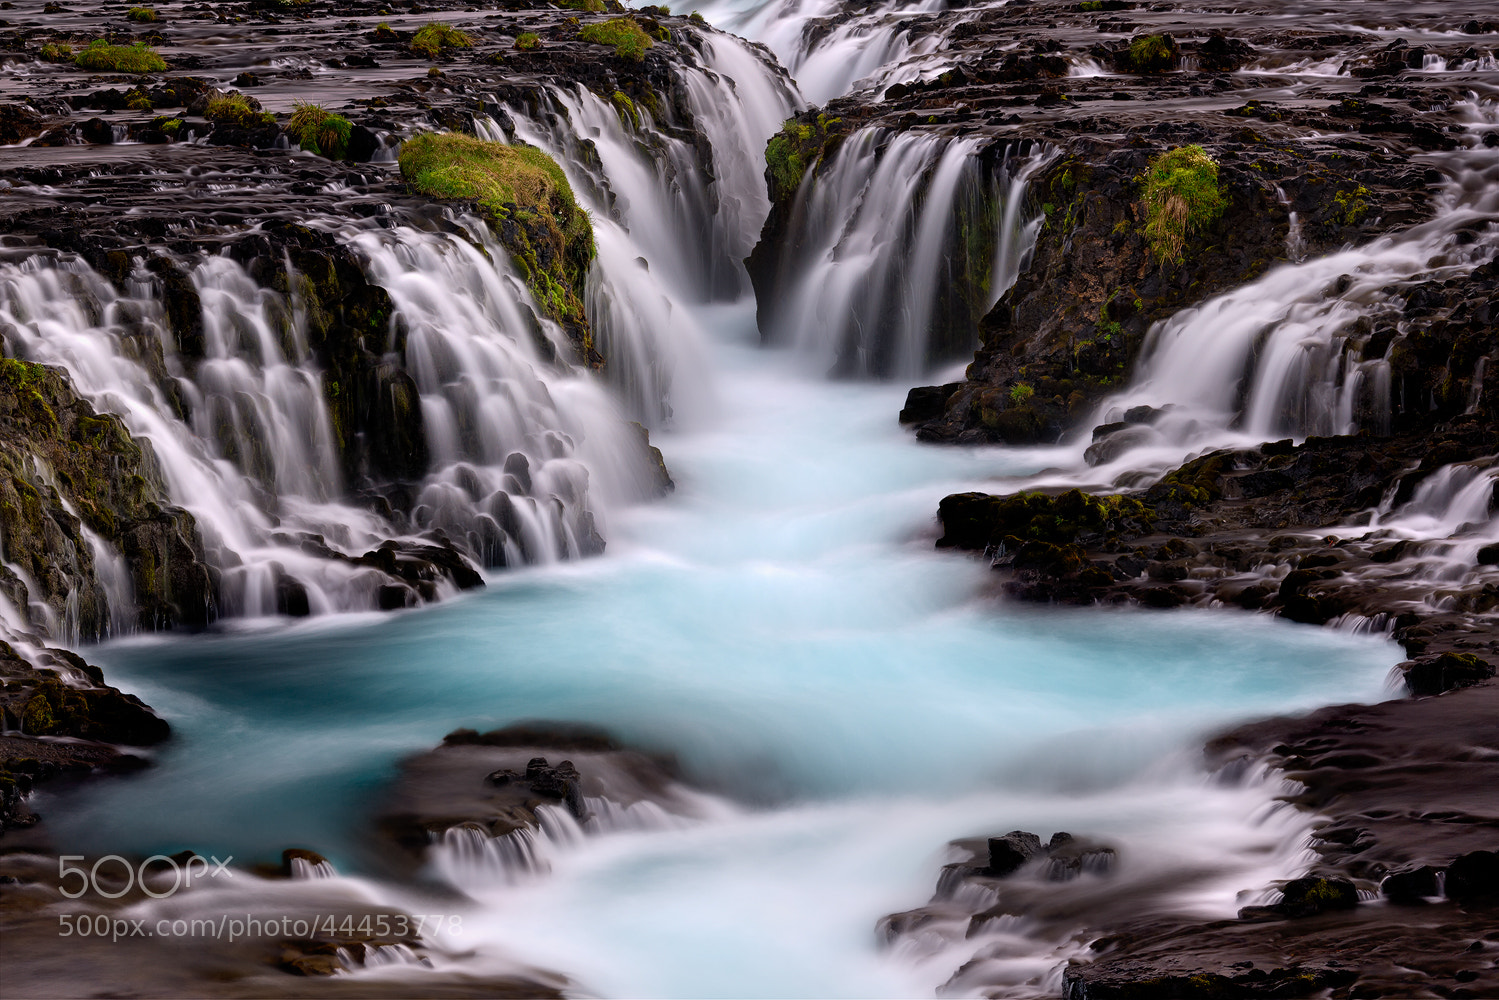 Photograph Bruarfoss by James Newkirk on 500px